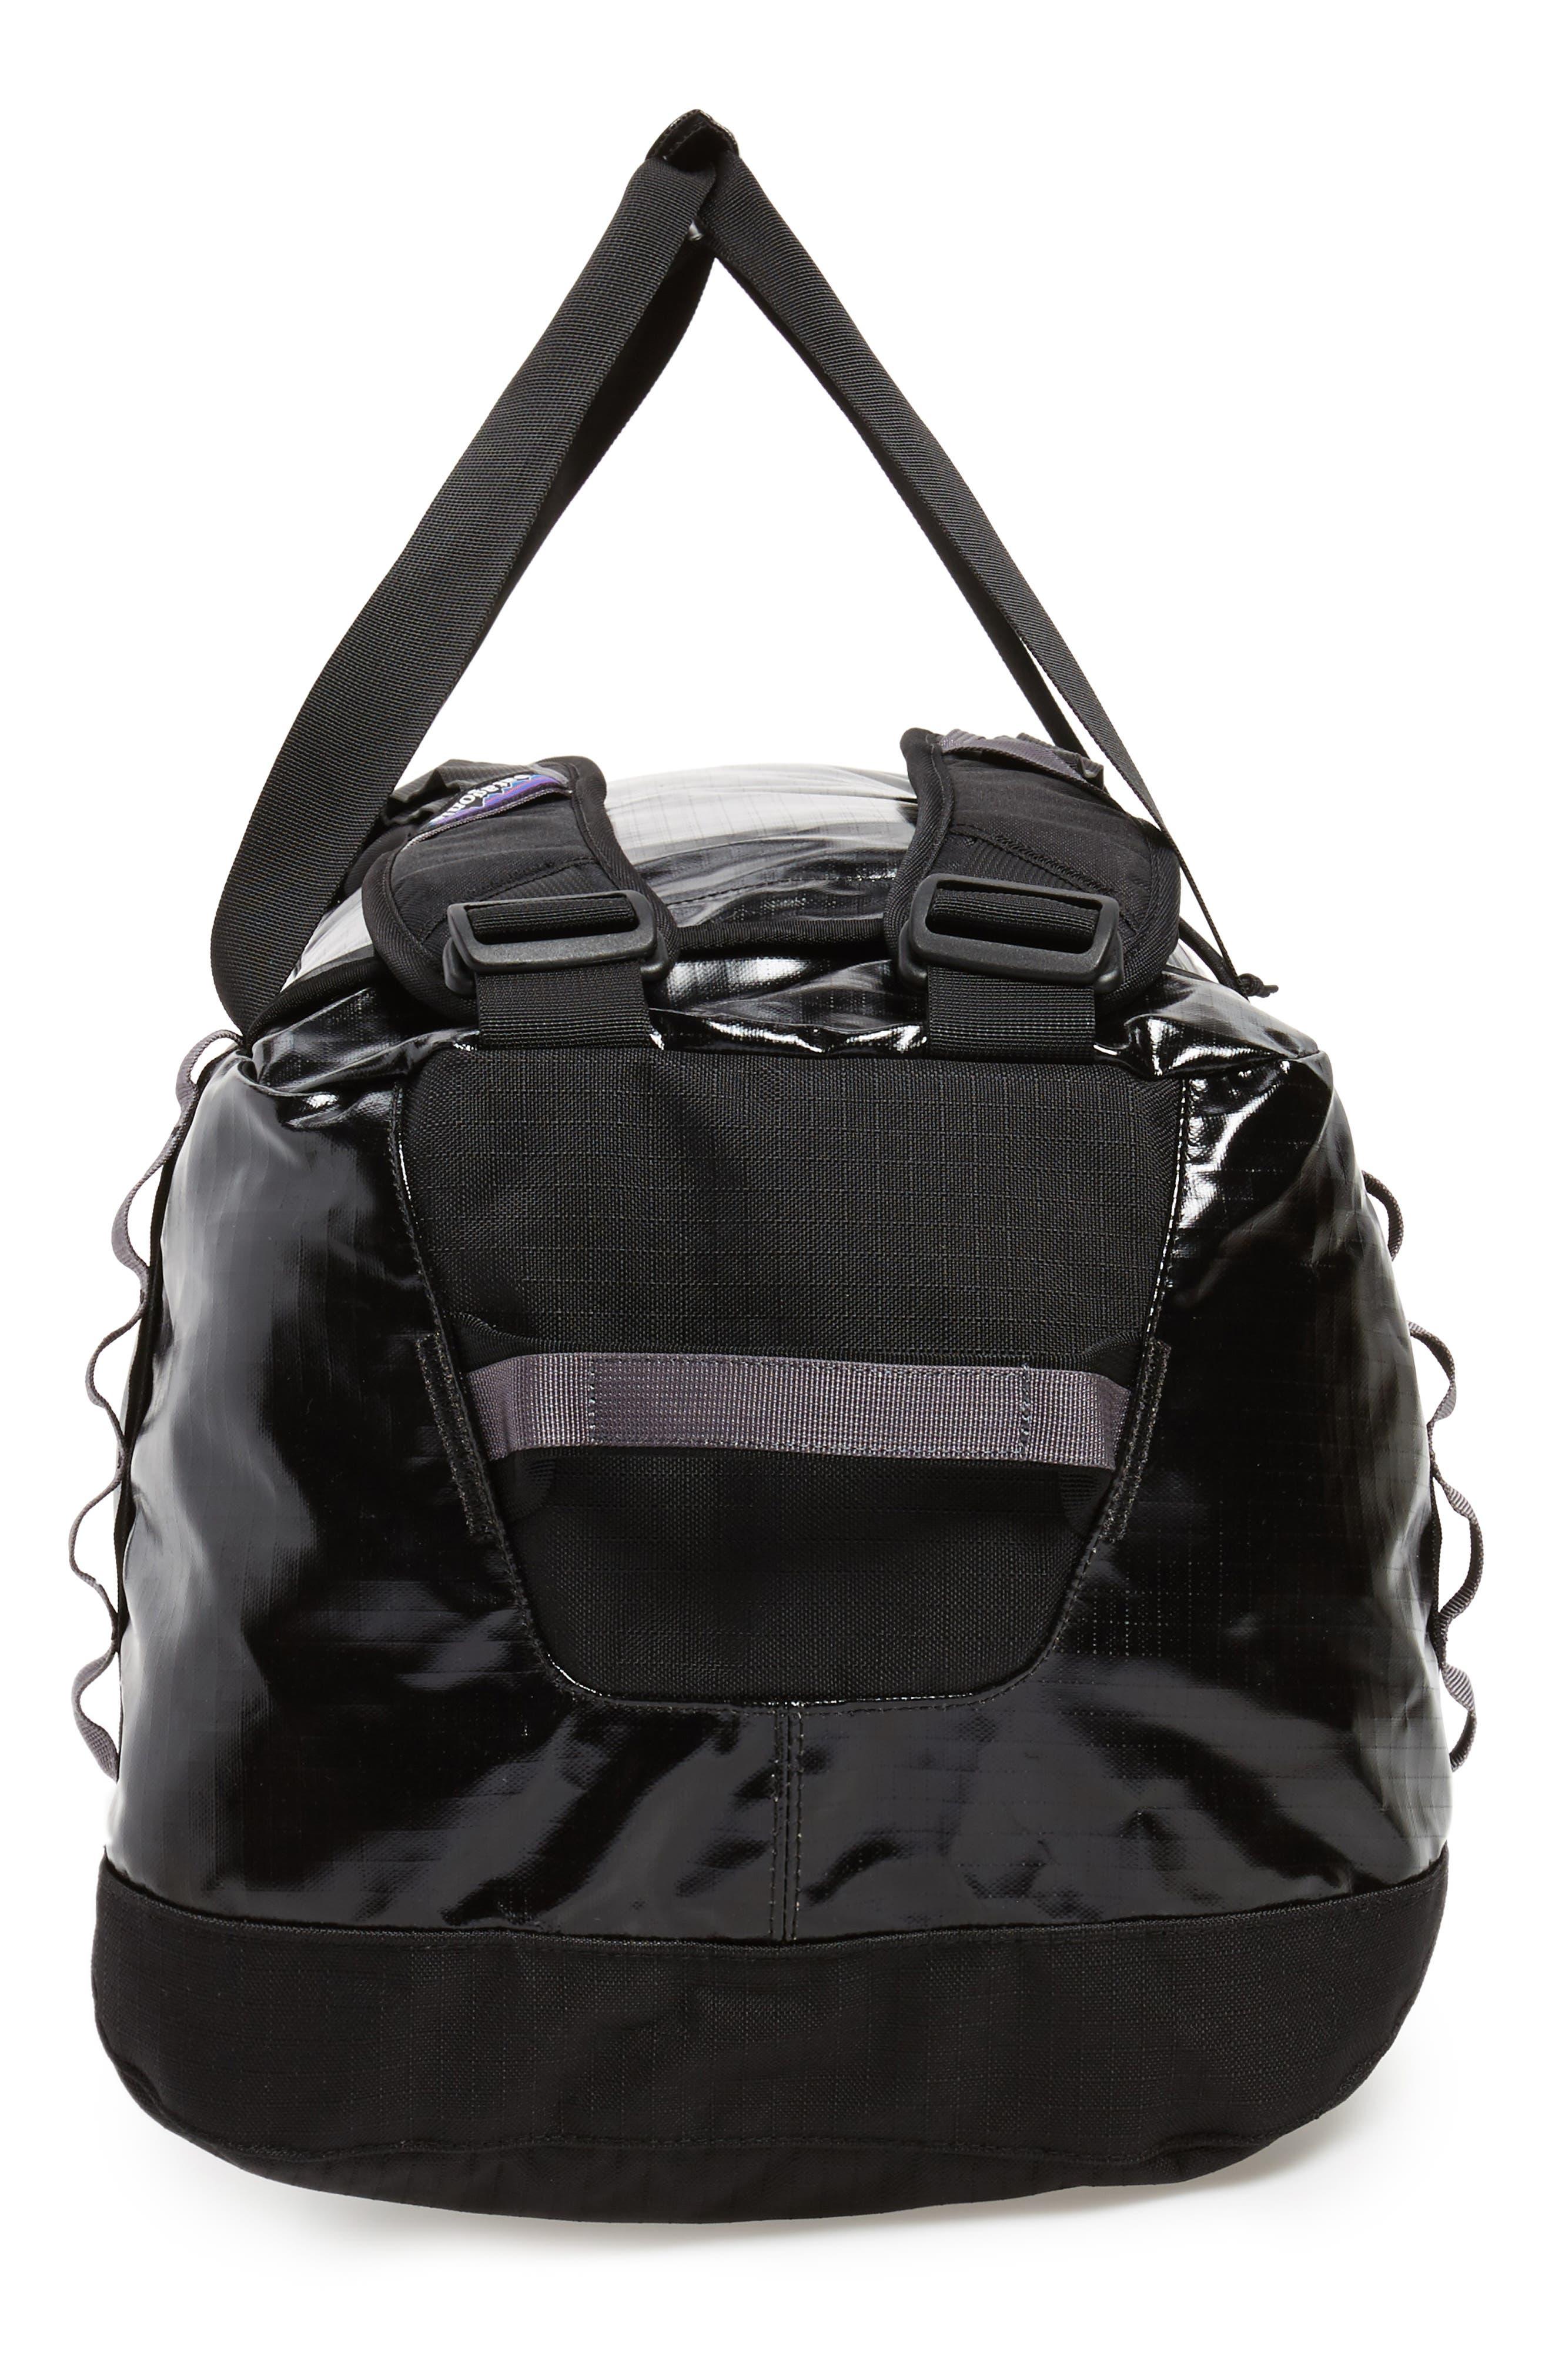 Black Hole Water Repellent Duffel Bag,                             Alternate thumbnail 5, color,                             Black